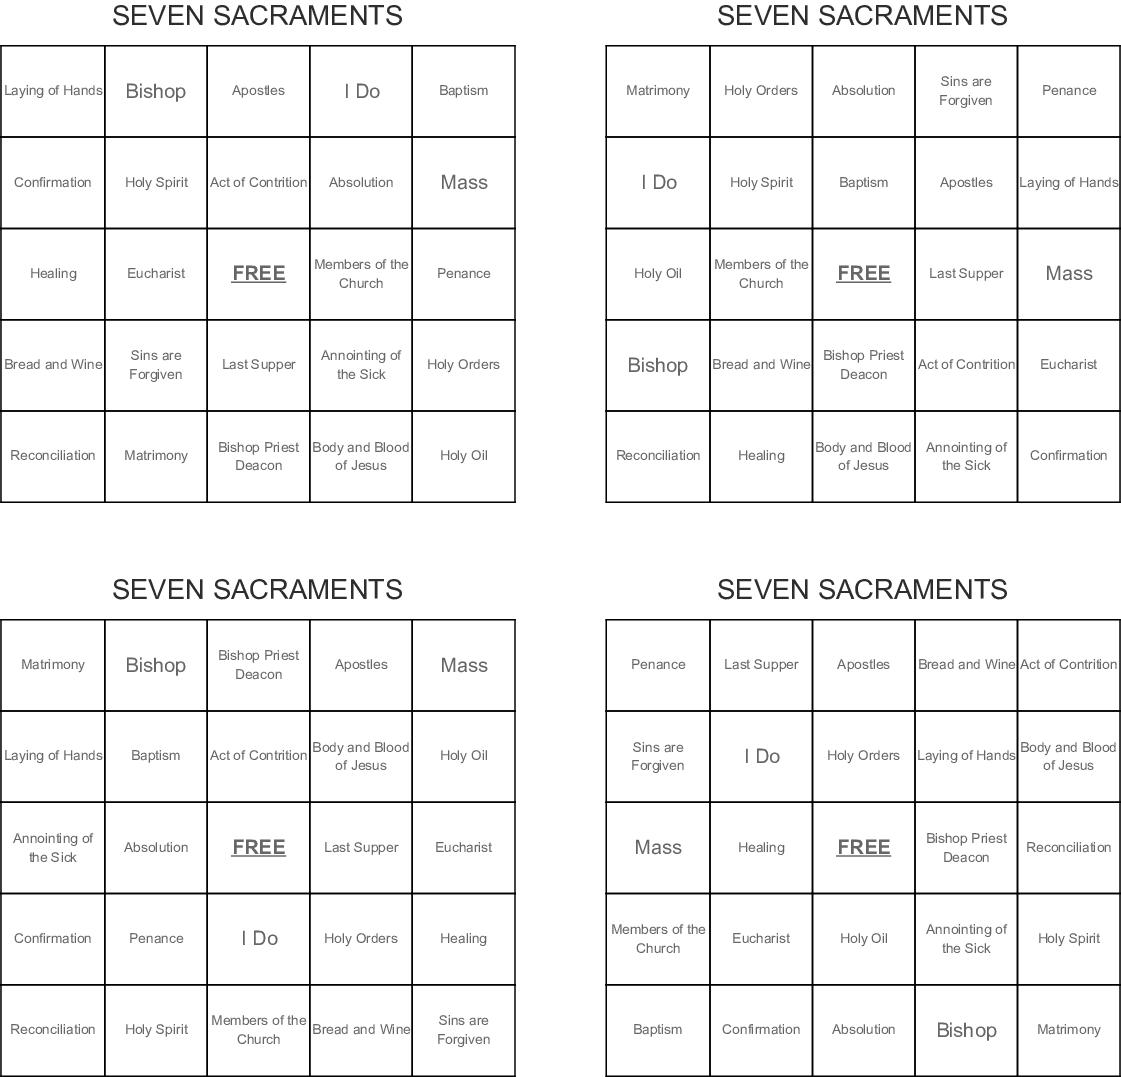 Seven Sacraments Bingo Cards